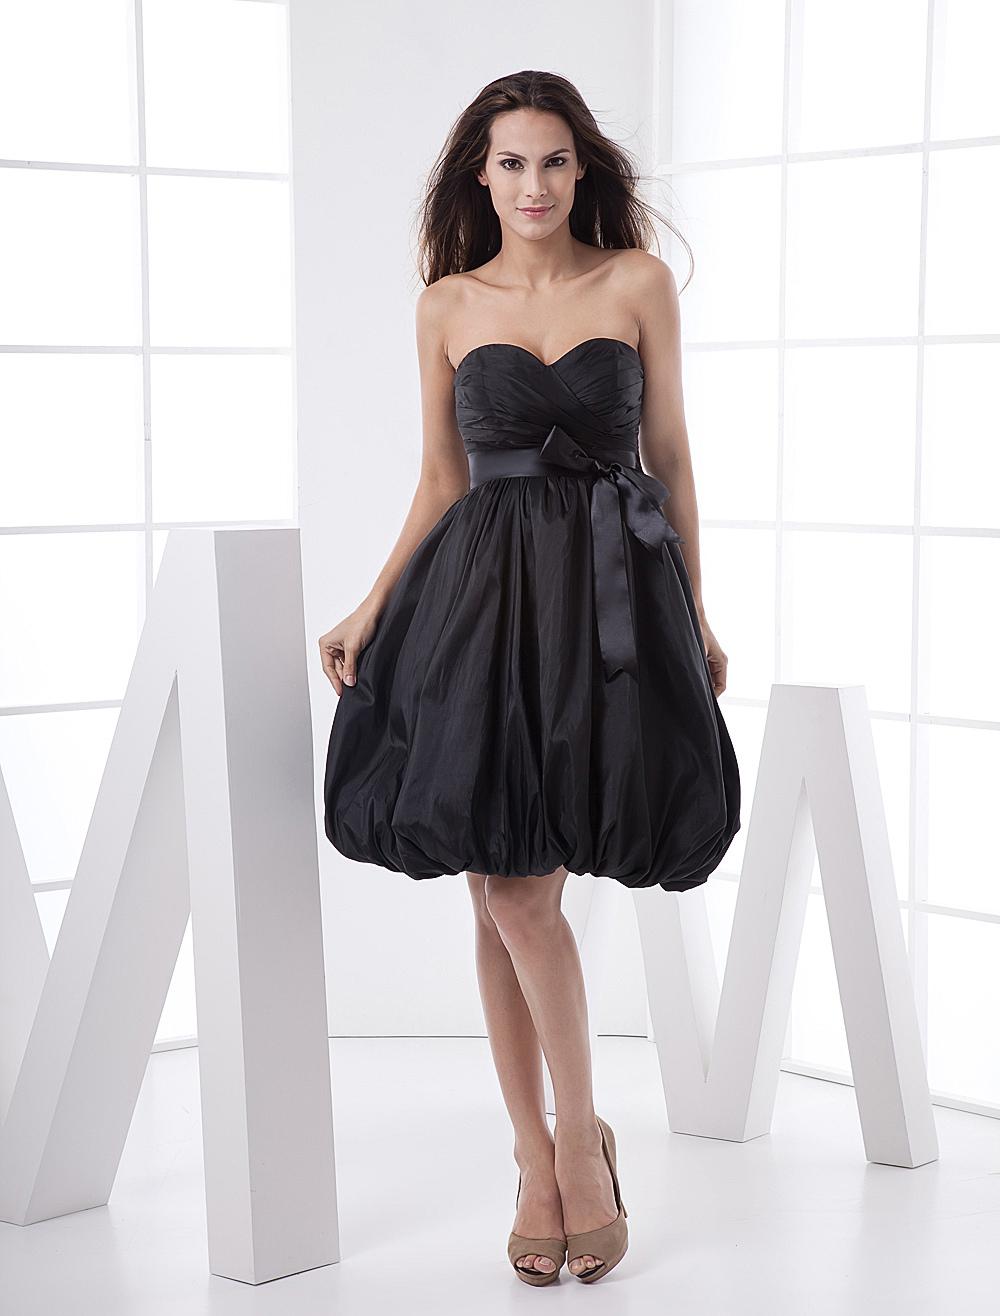 Black Fashion Sweetheart Strapless Empire Waist Taffeta Prom Dress (Wedding Cheap Party Dress) photo